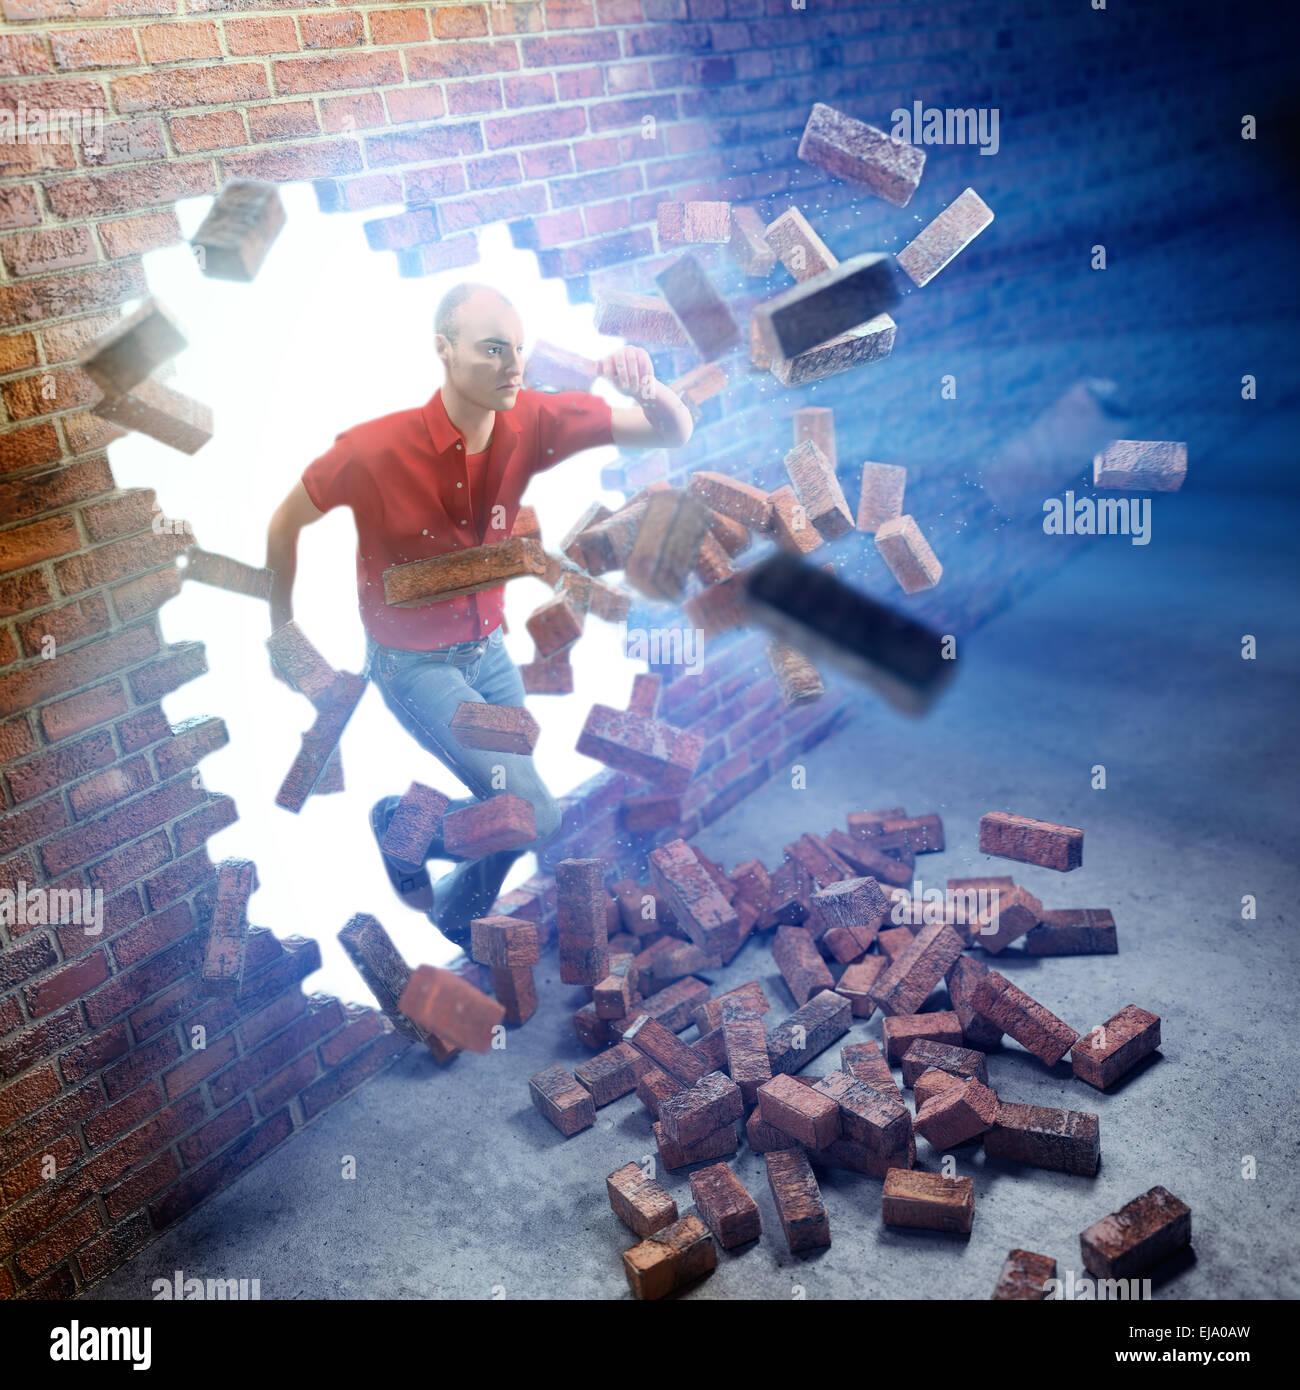 Young man running through a brick wall - Stock Image